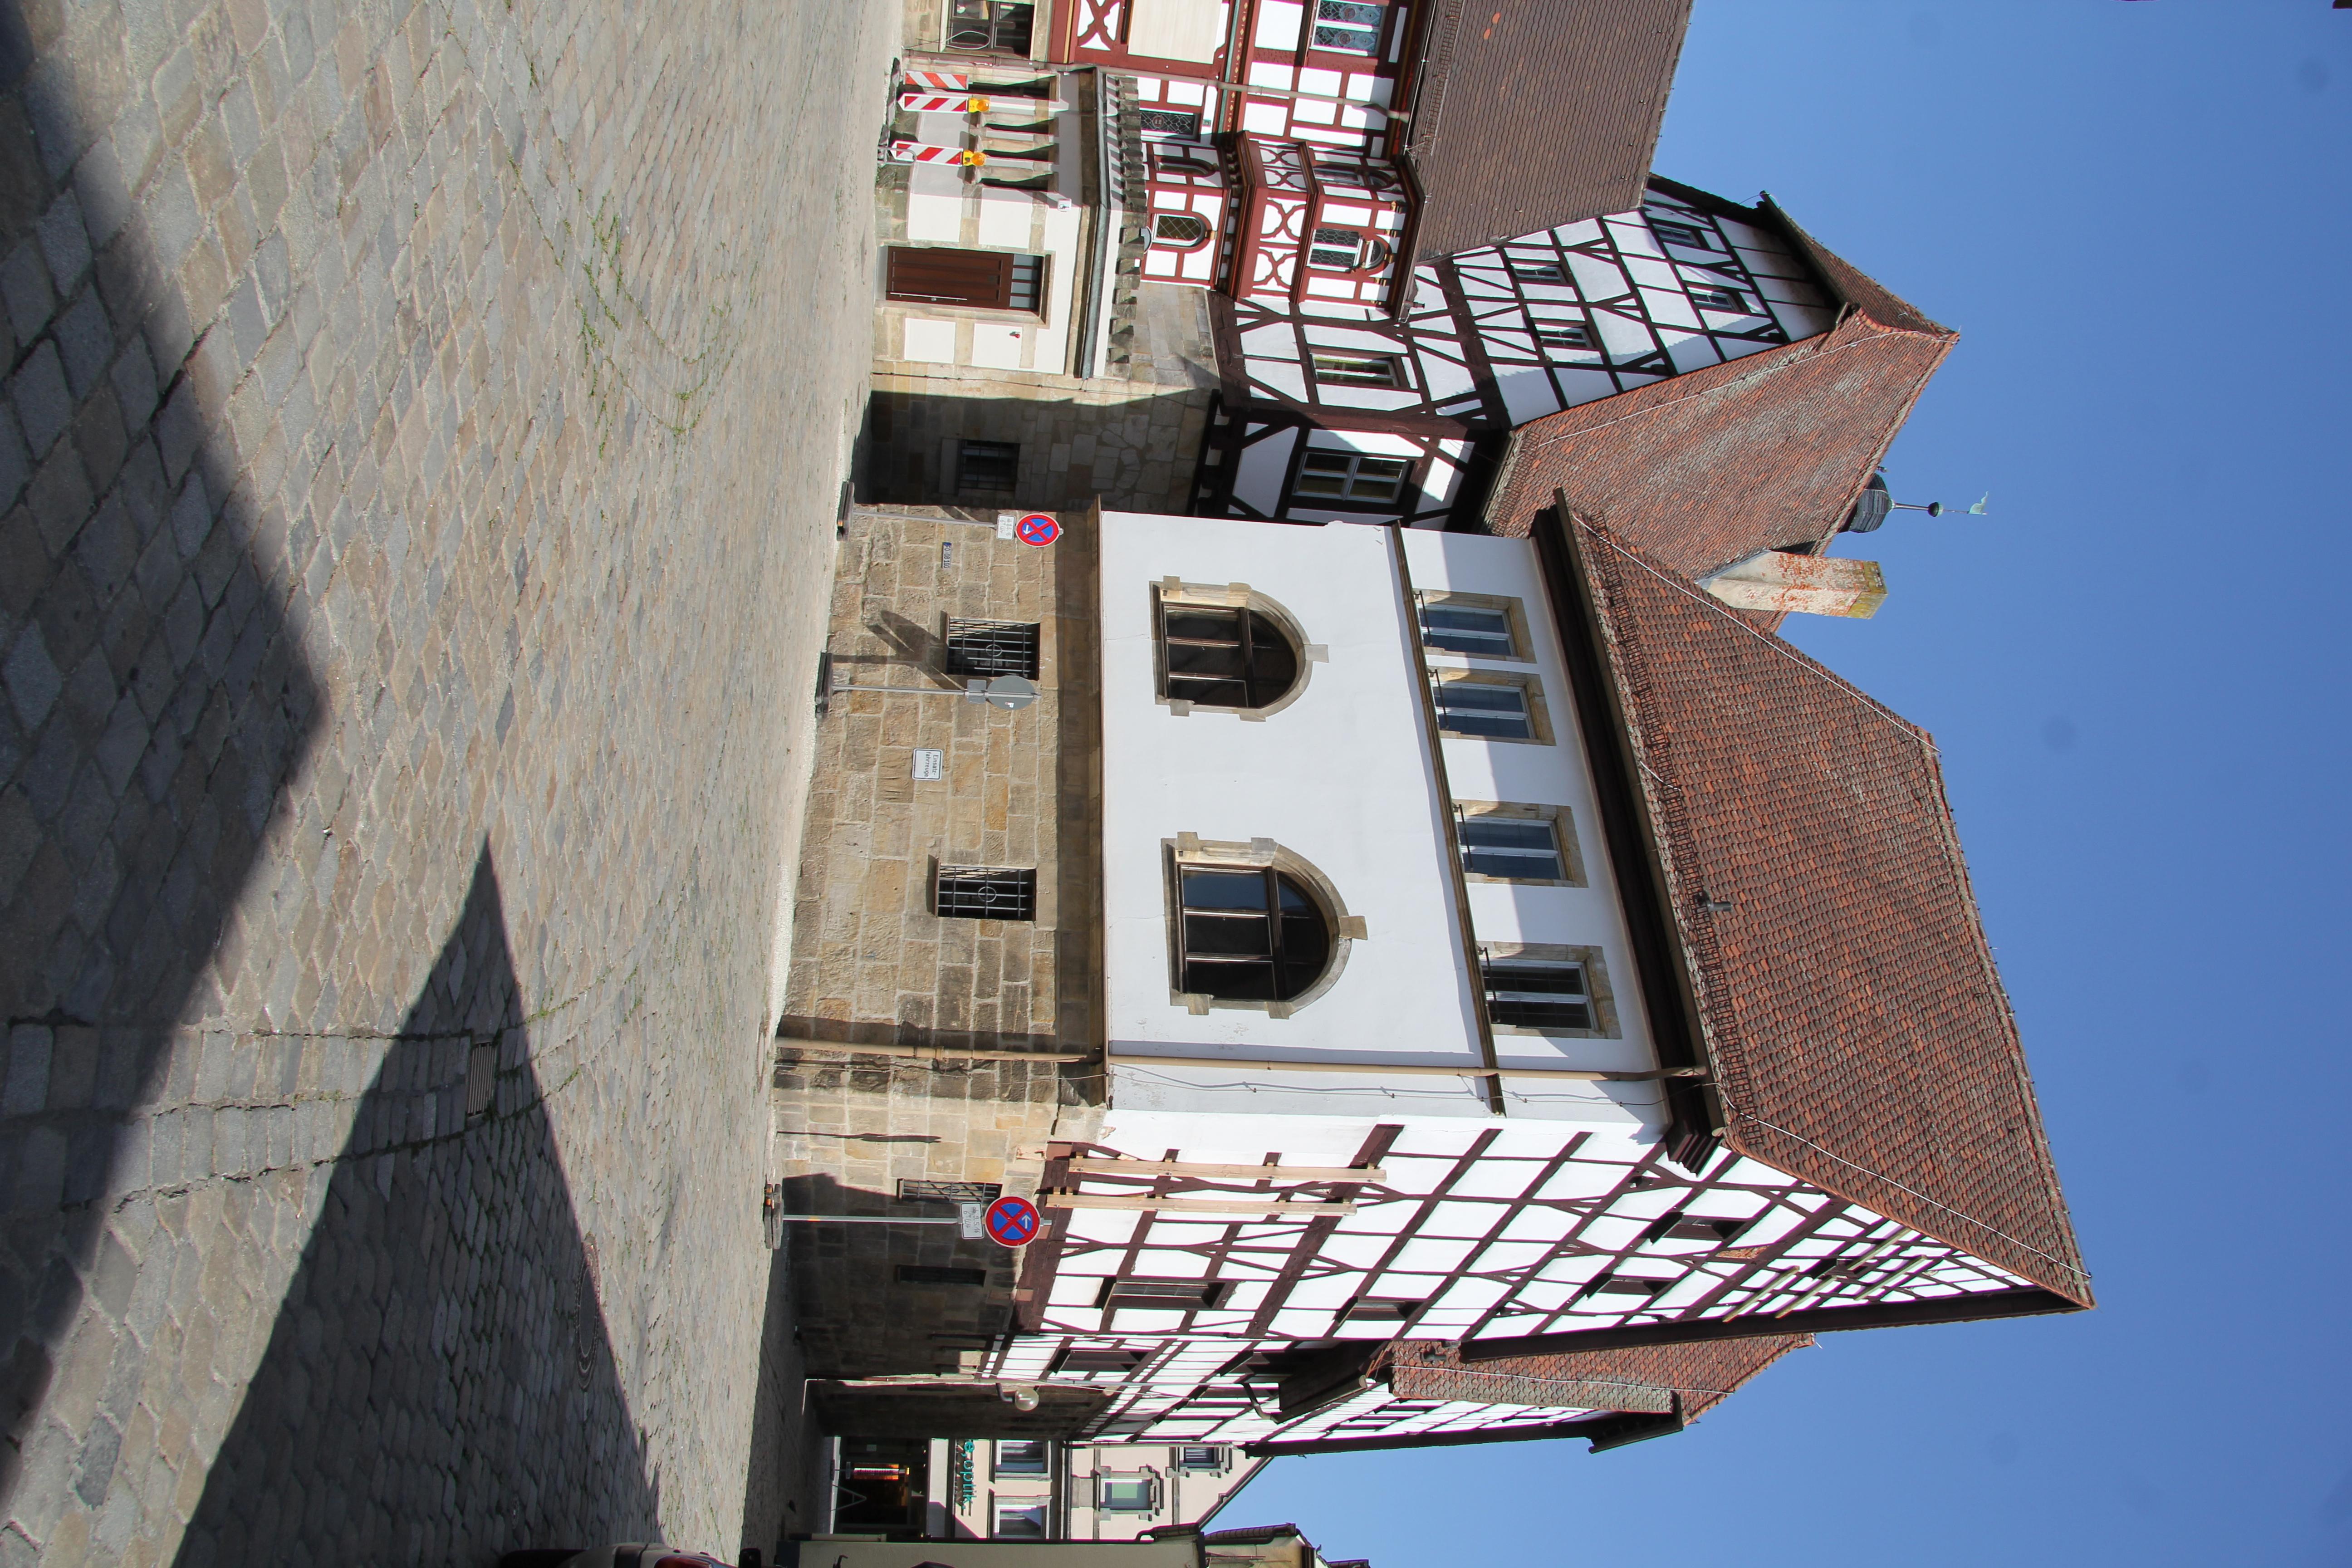 File:D-4-74-126-92 Forchheim Rathaus Registratur.jpg - Wikimedia Commons